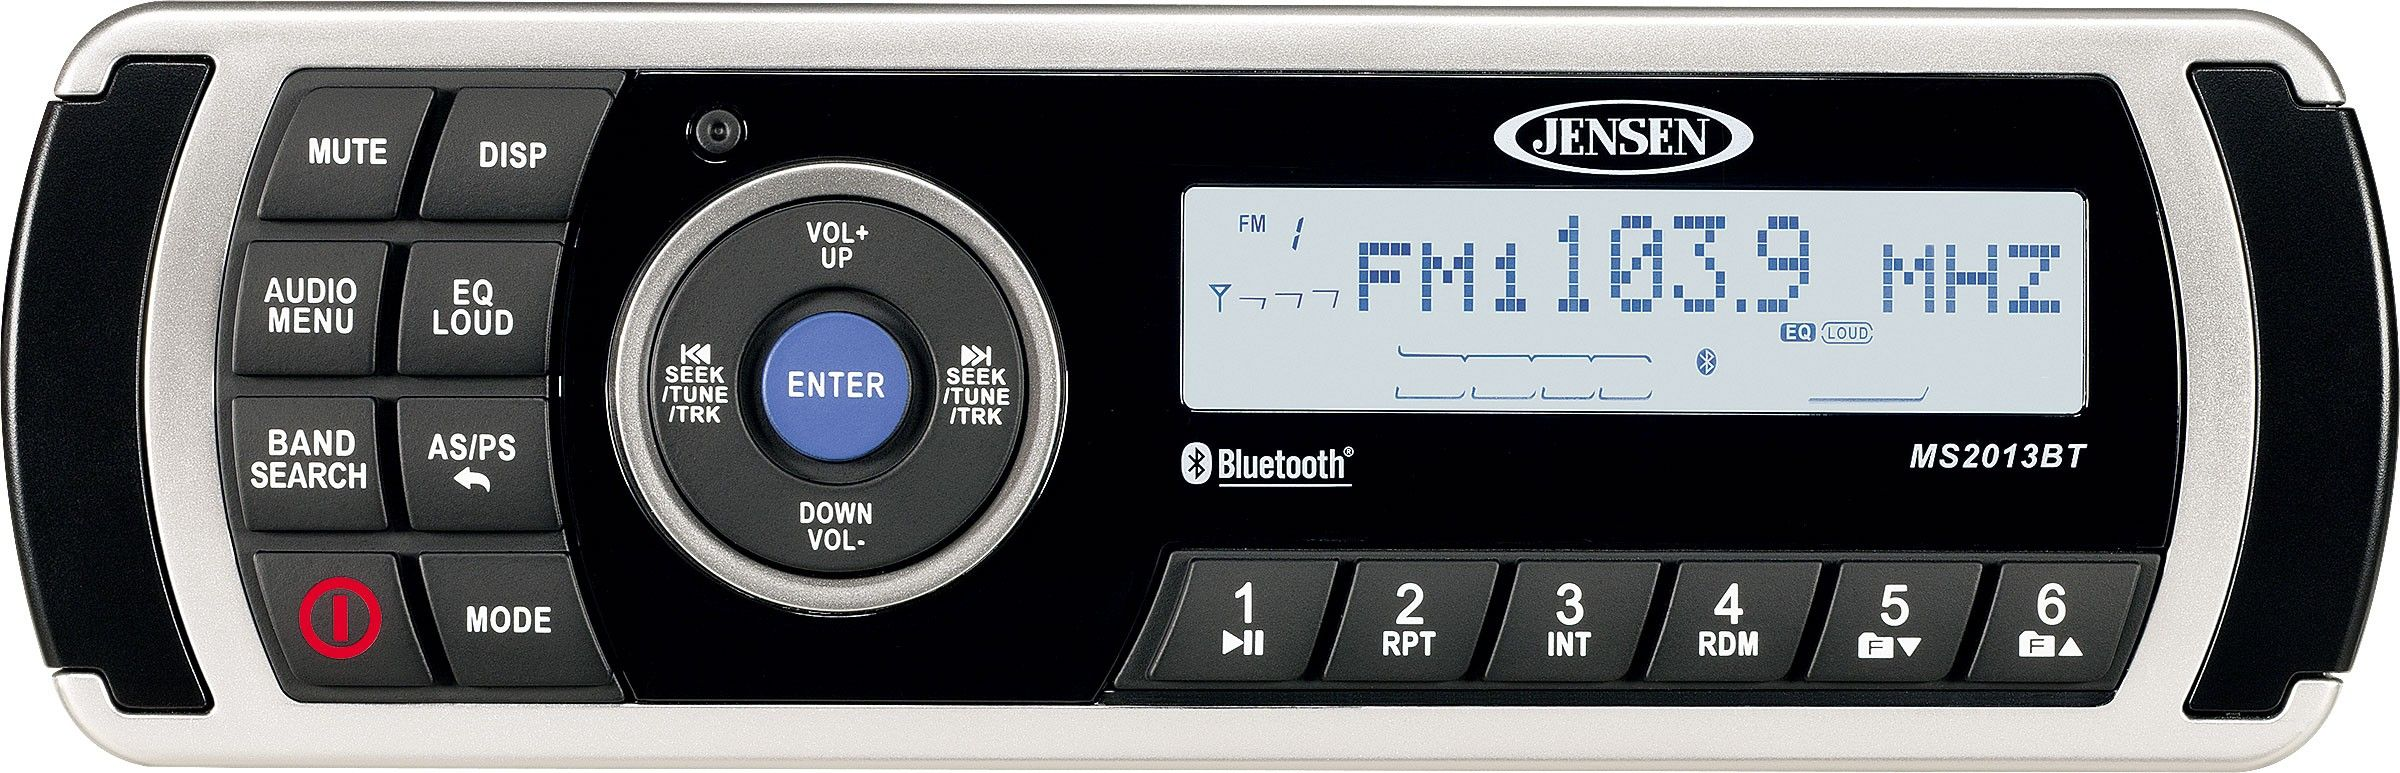 JENSEN MS2013BTR AM/FM/USB Waterproof Stereo with Bluetooth | JENSEN ...